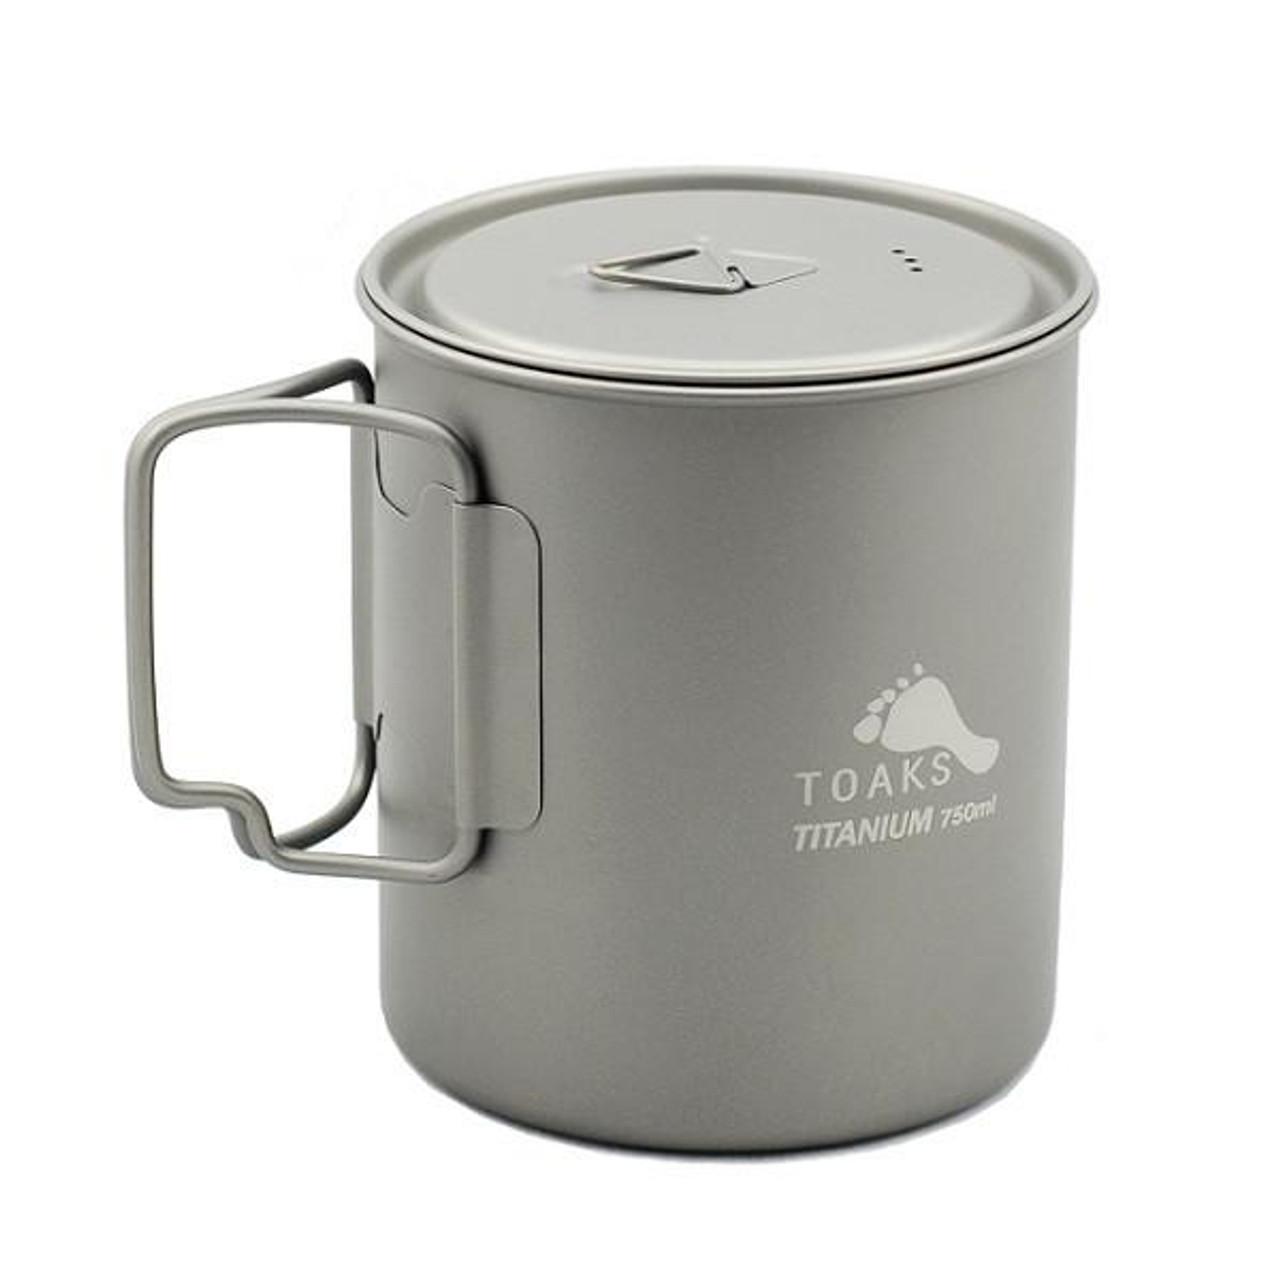 Toaks Titanium 750ml with handle